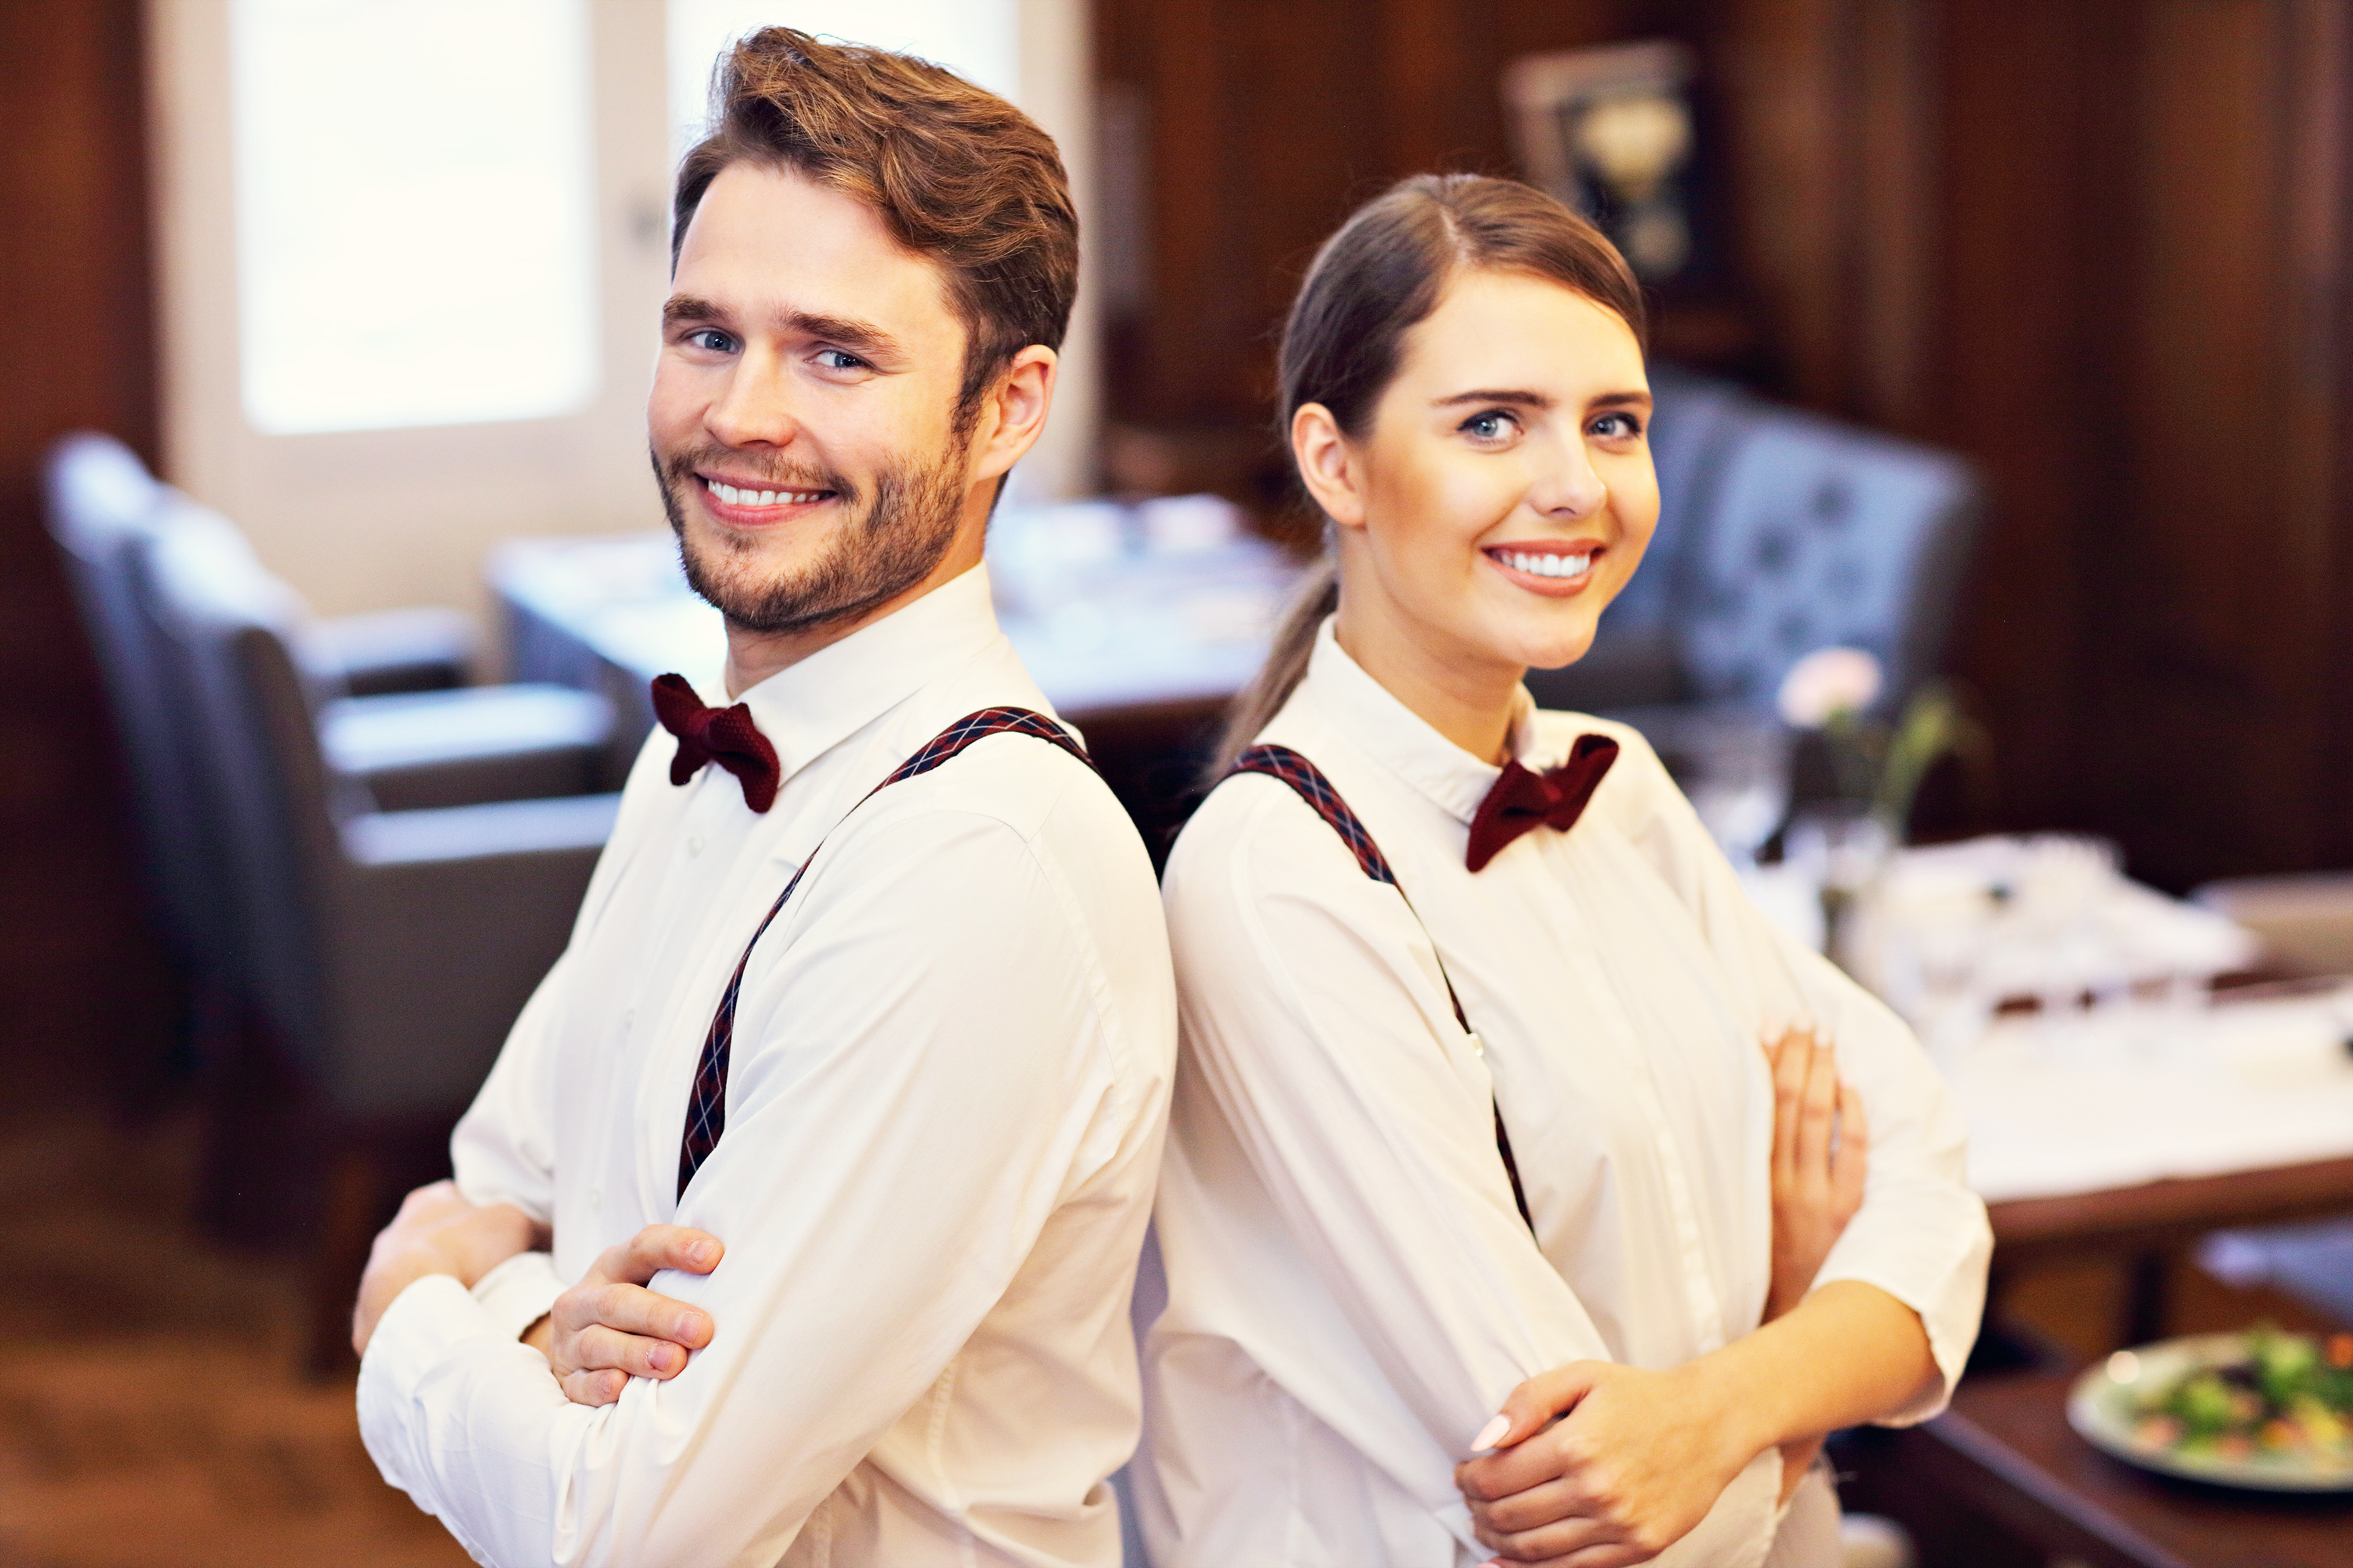 Onestaff - Hospitality & Retail